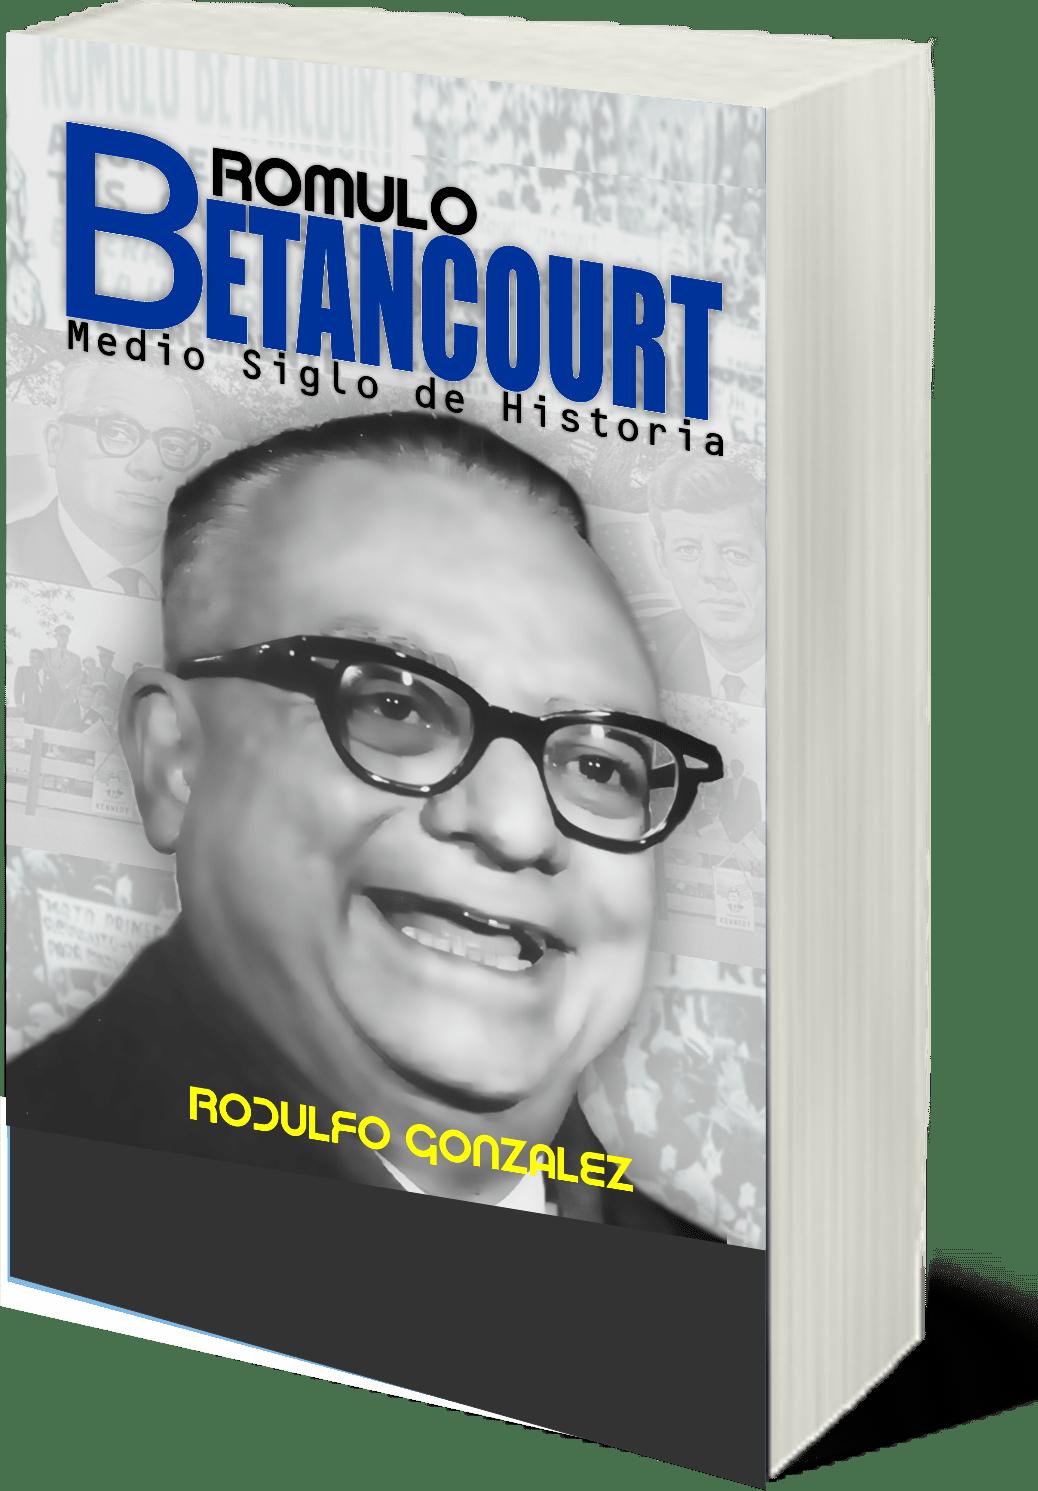 Romulo Betancourt Medio Siglo de Historia por Rodulfo Gonzalez